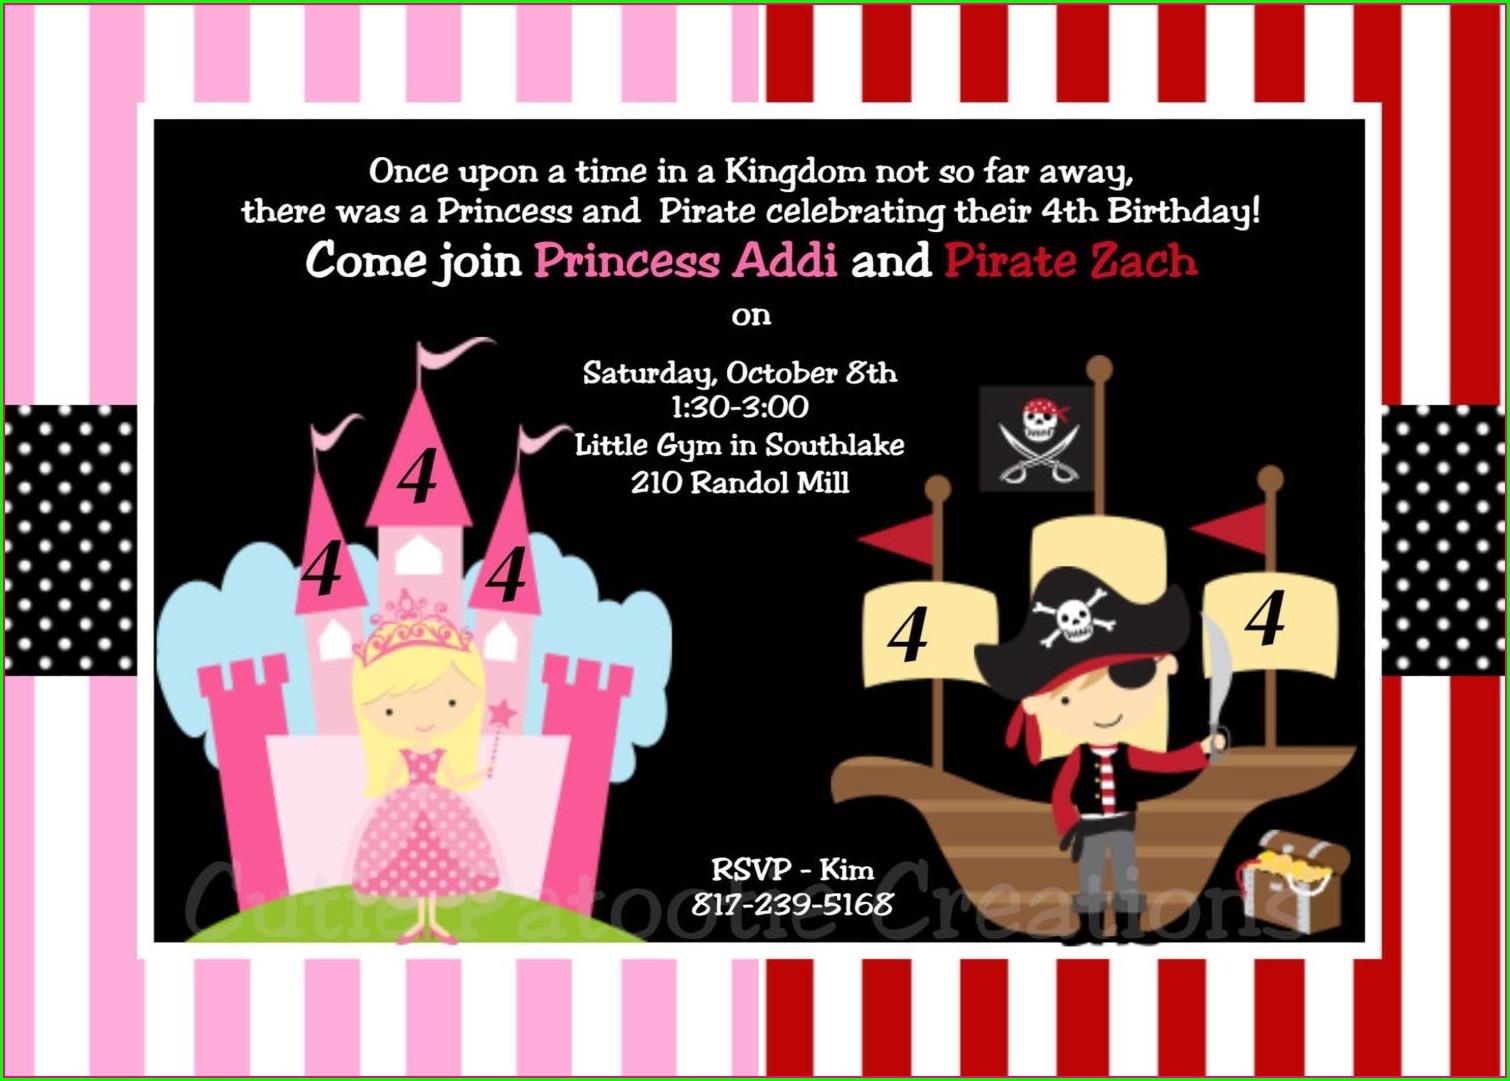 Princess And Pirate Invitation Template